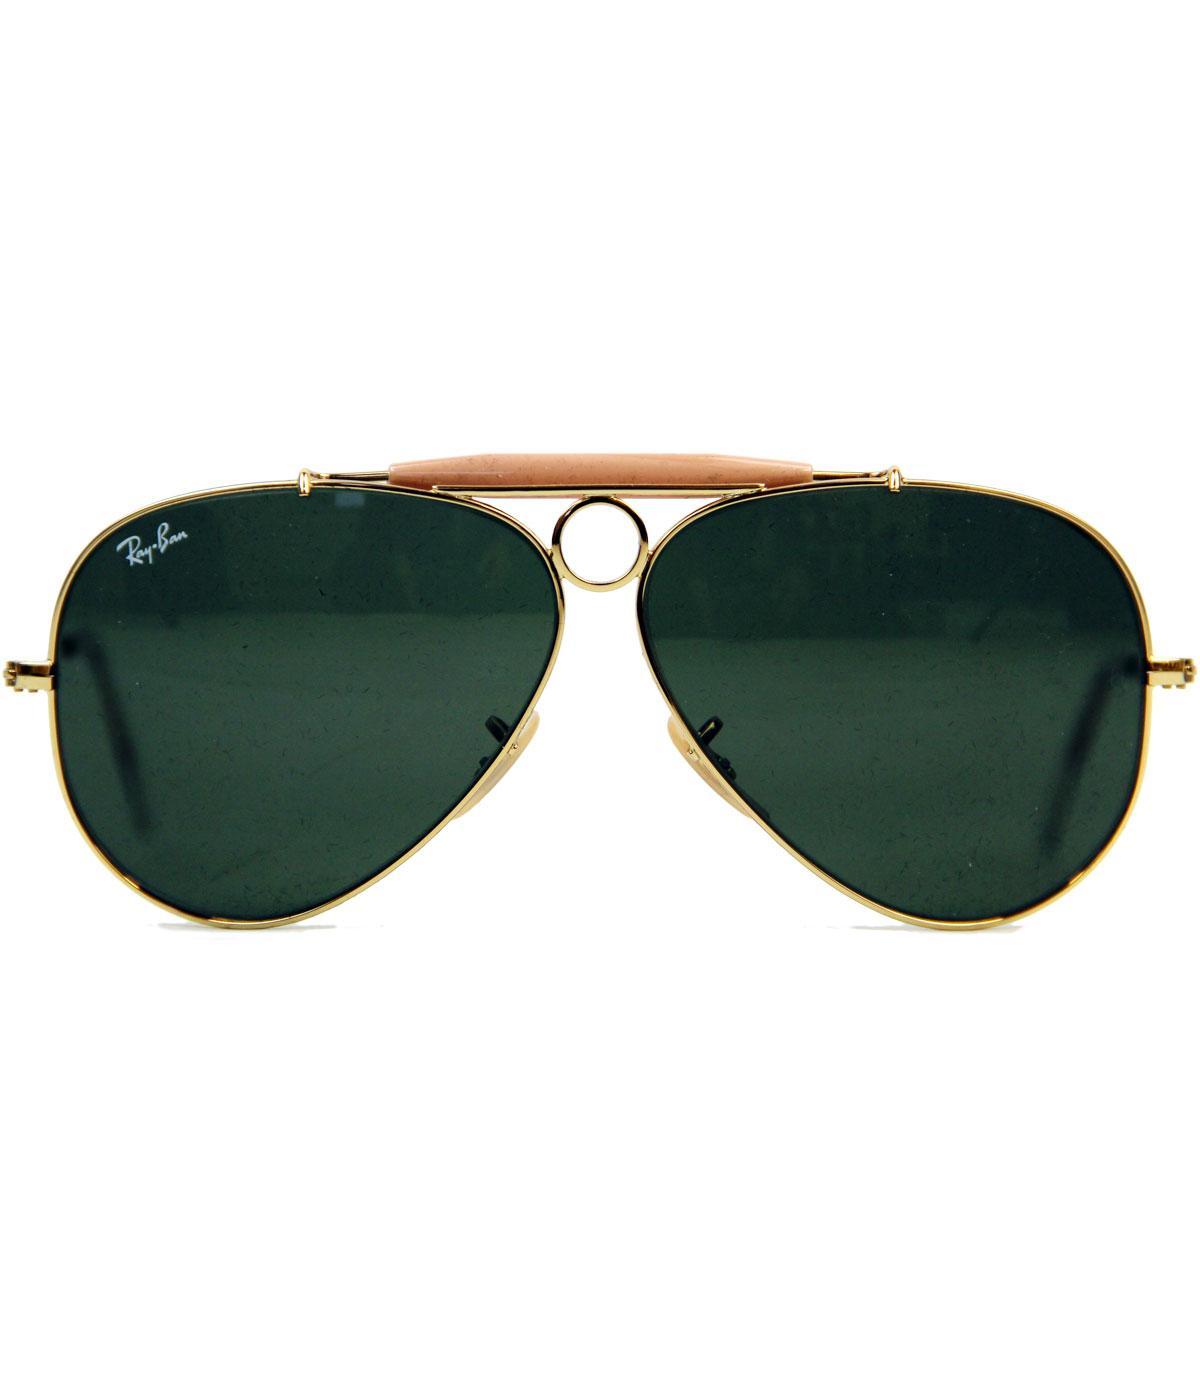 Shooter Ray-Ban Icon Retro Sixties Mod Sunglasses